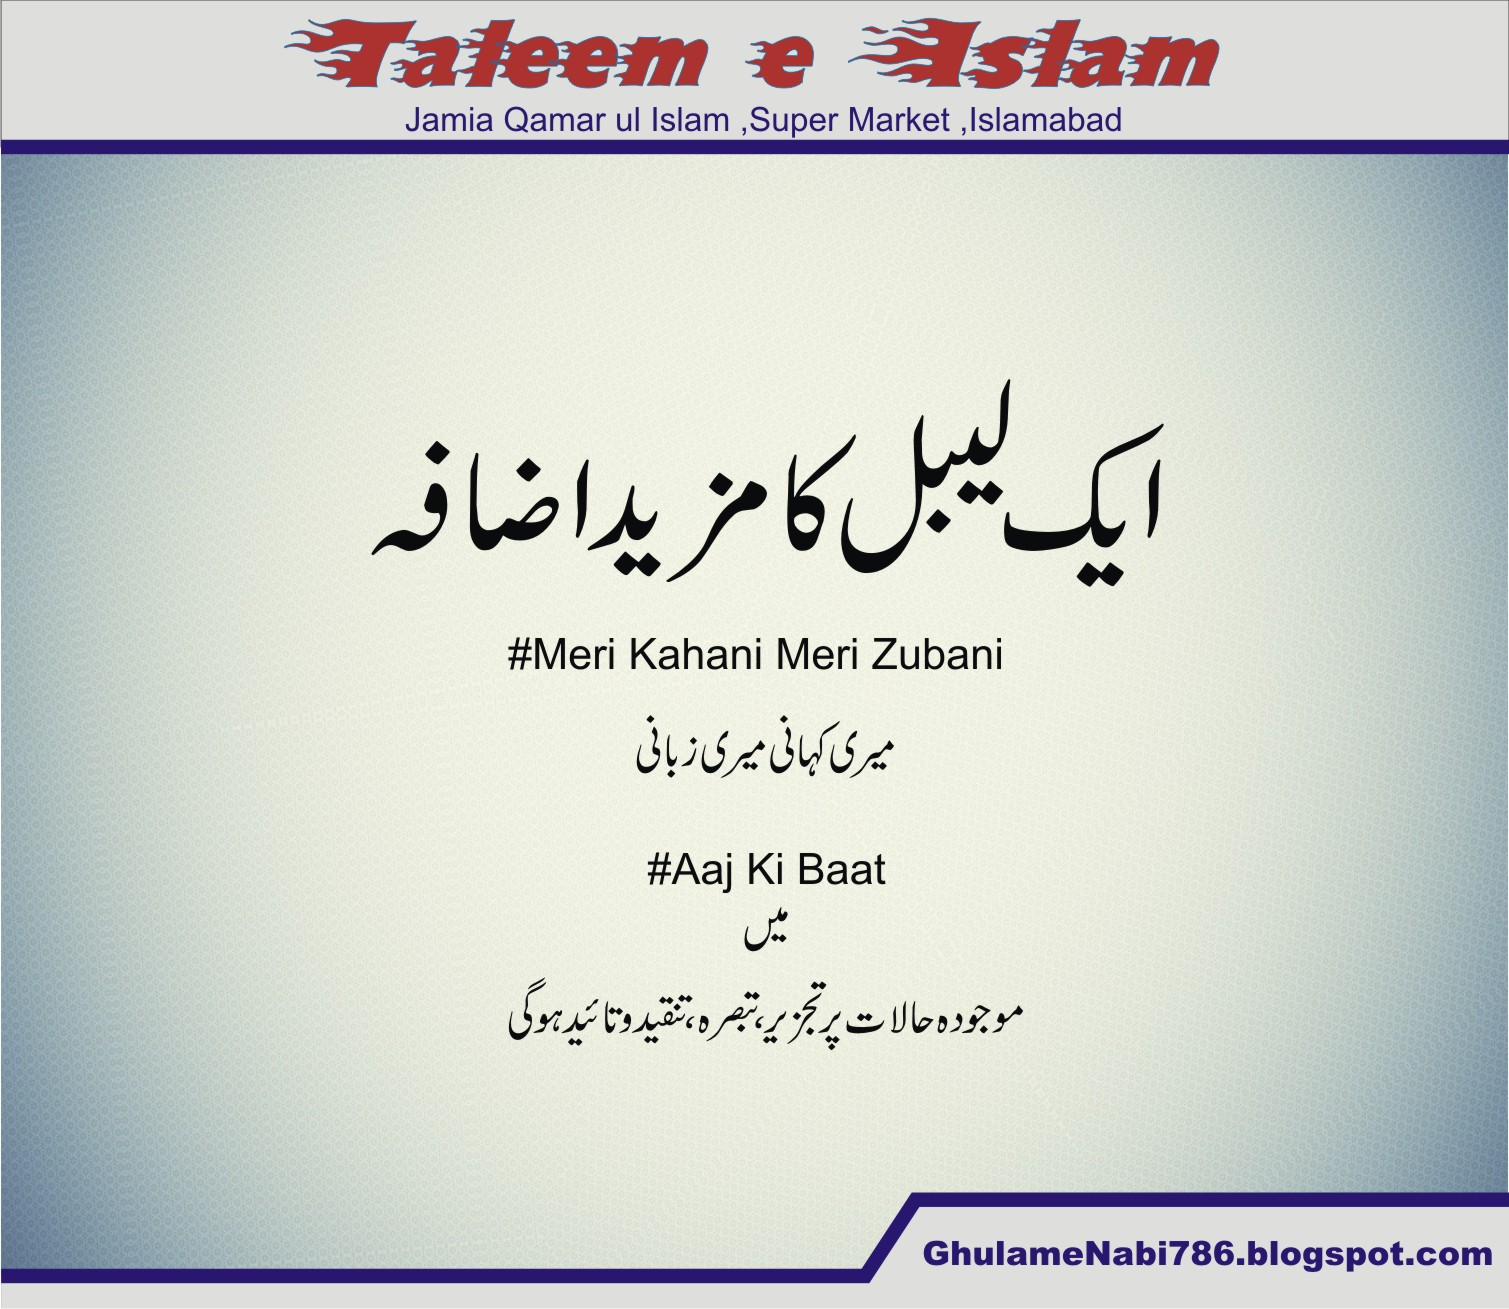 Meri Kahani Meri Zubani aur #Aaj Ki Baat Labels me yeh